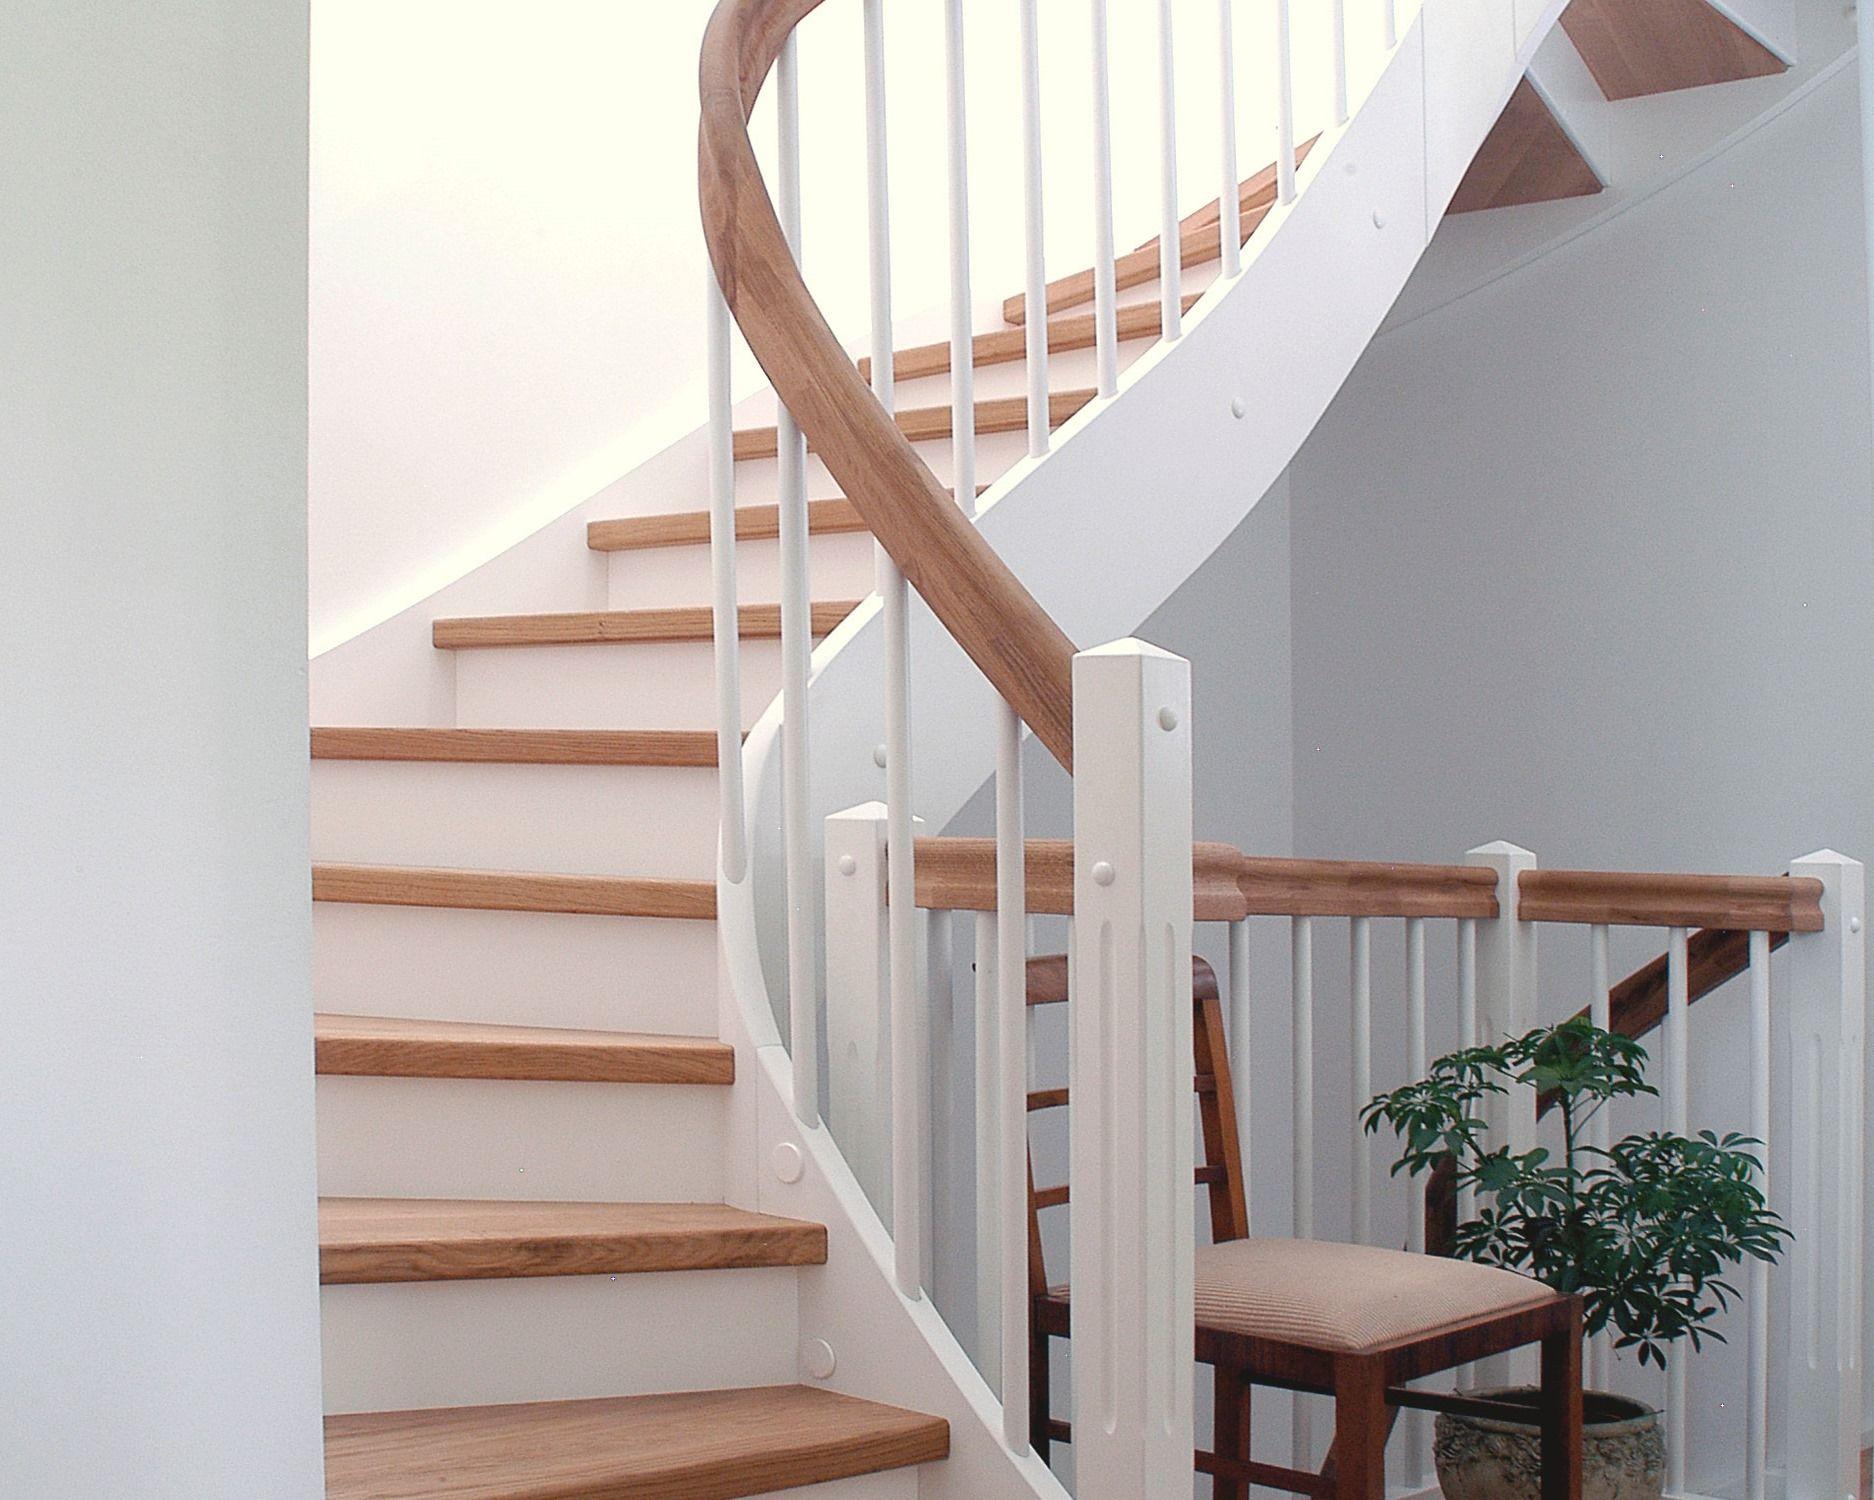 treppe eingestemmt mit setzstufen pinterest setzstufen treppe und gel nder. Black Bedroom Furniture Sets. Home Design Ideas